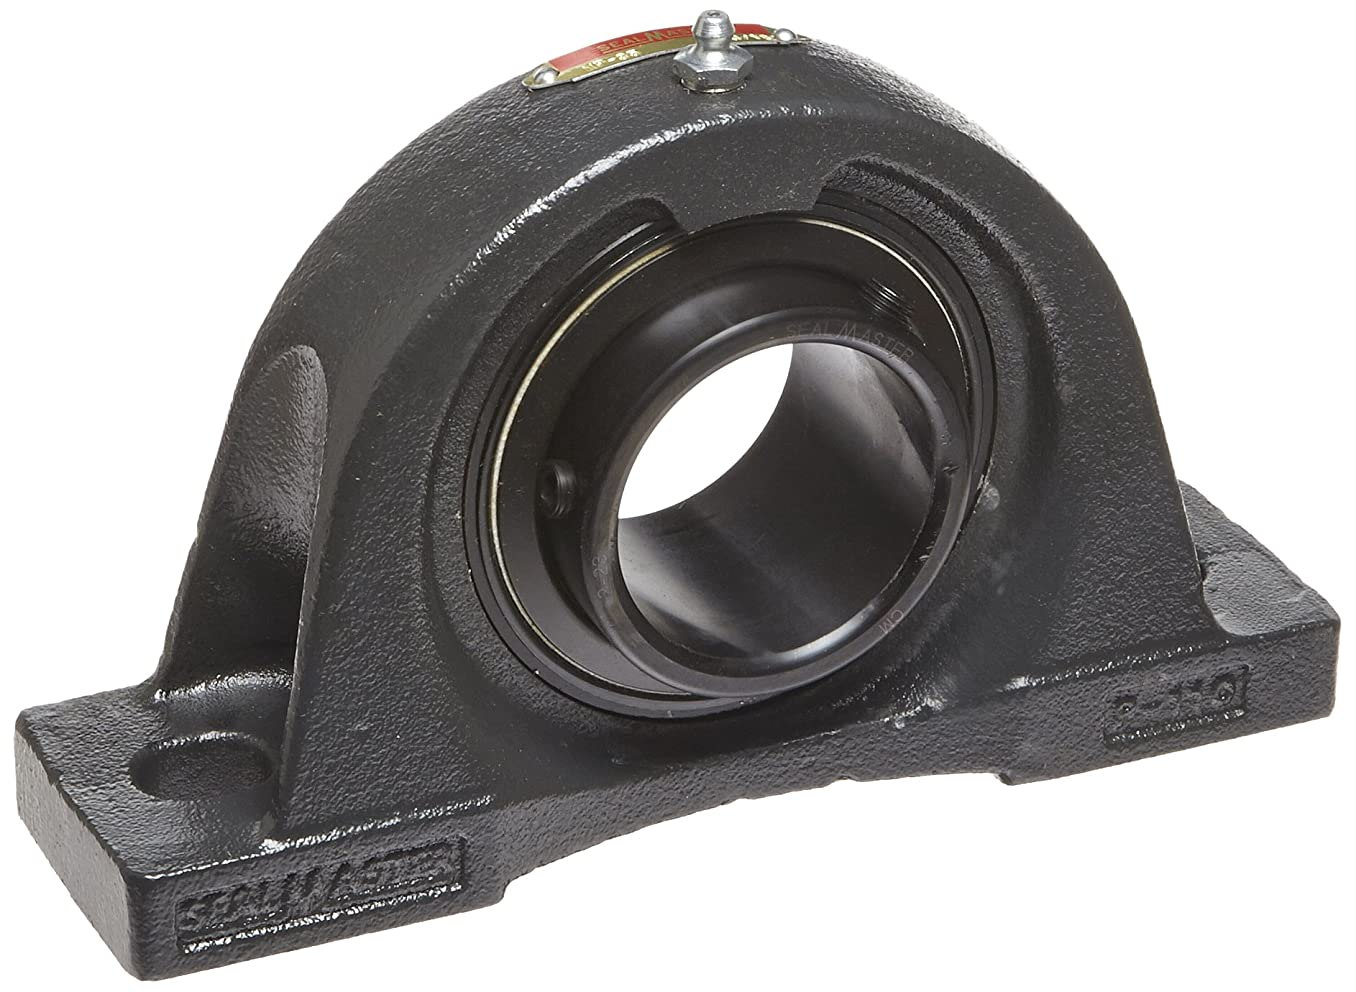 Sealmaster NP-35 Pillow Block Ball Bearing, Non-Expansion Type, Normal-Duty, Regreasable, Setscrew Locking Collar, Felt Seals, Cast Iron Housing, 2-3/16